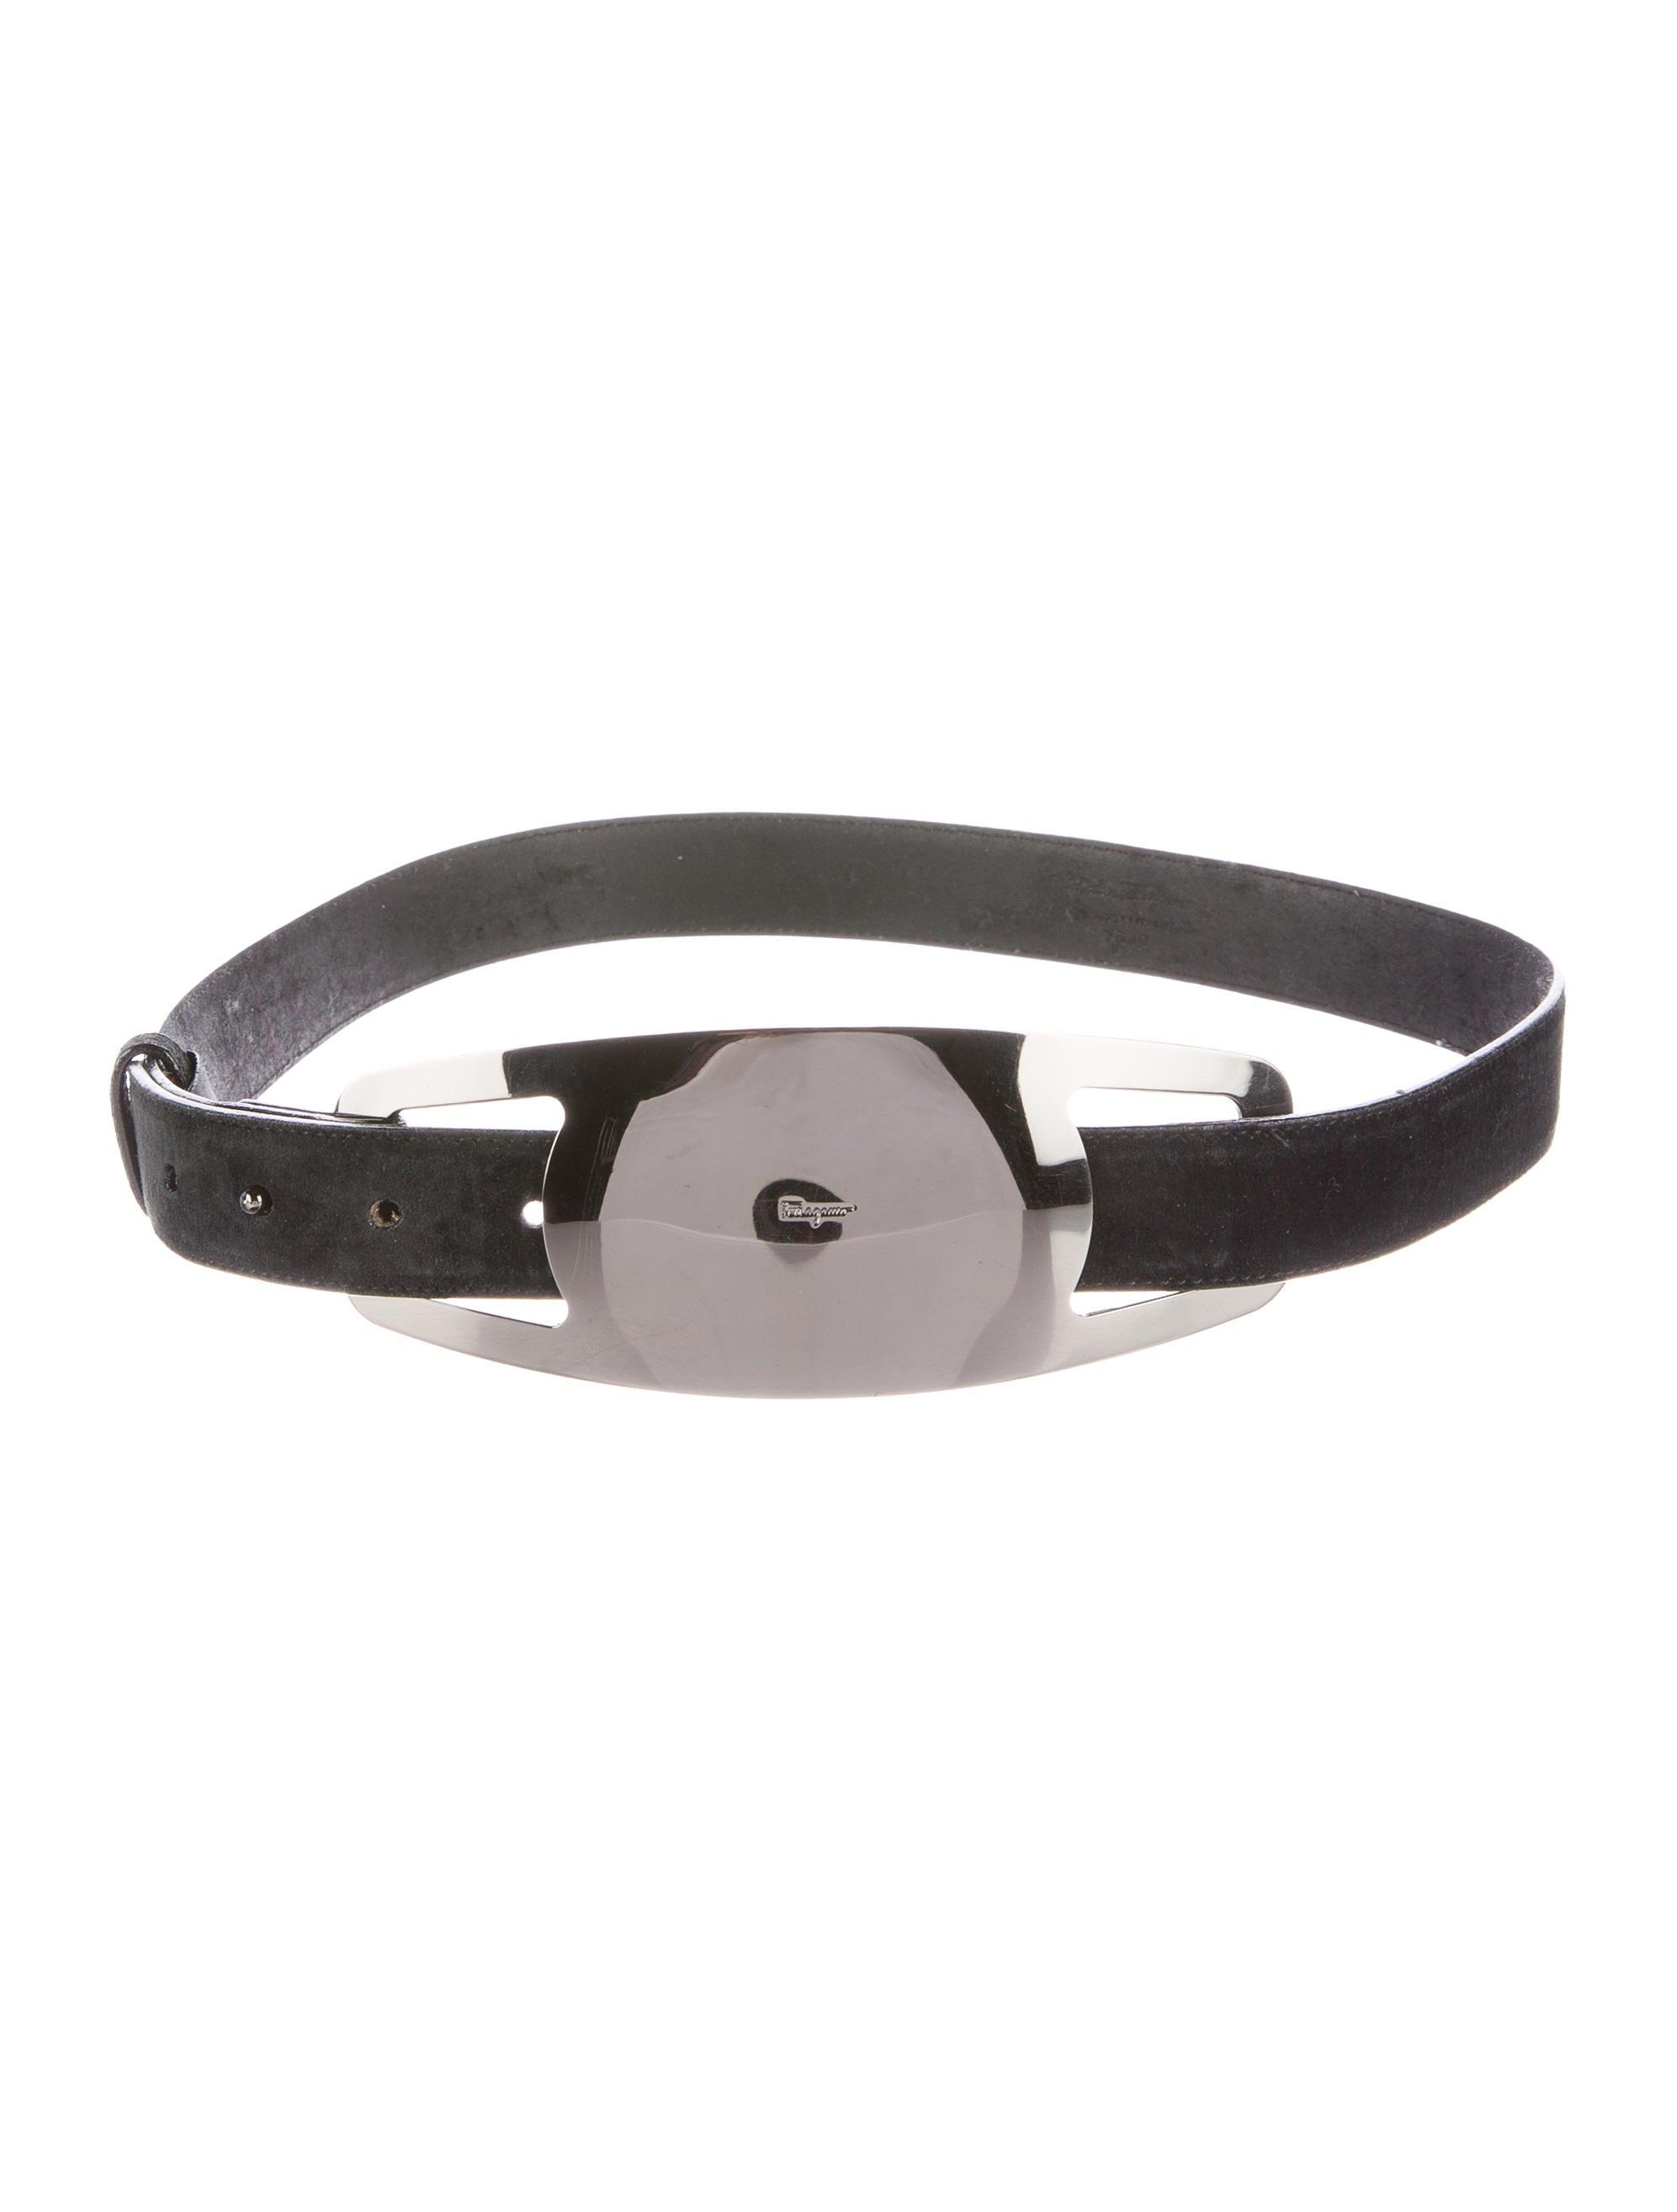 salvatore ferragamo suede leather belt accessories